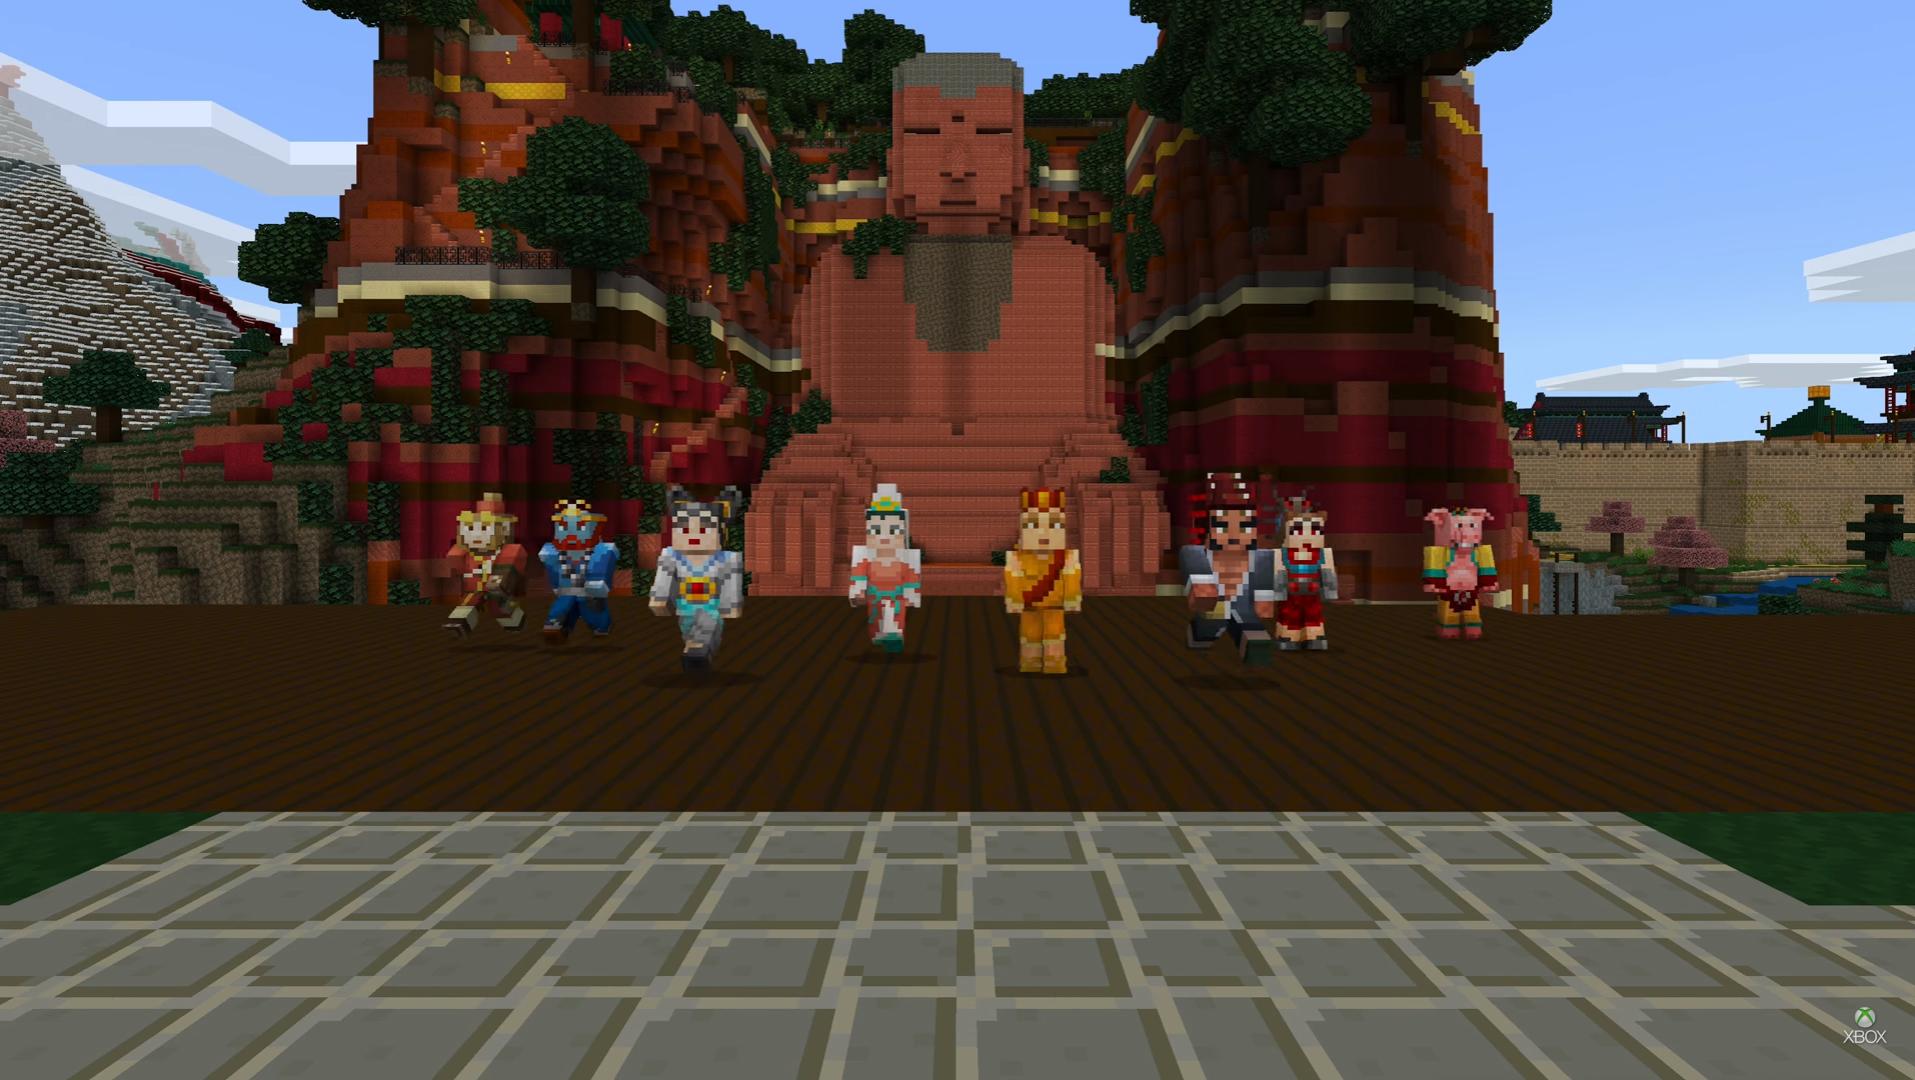 Minecraft Super Duper Graphics Pack has been delayed